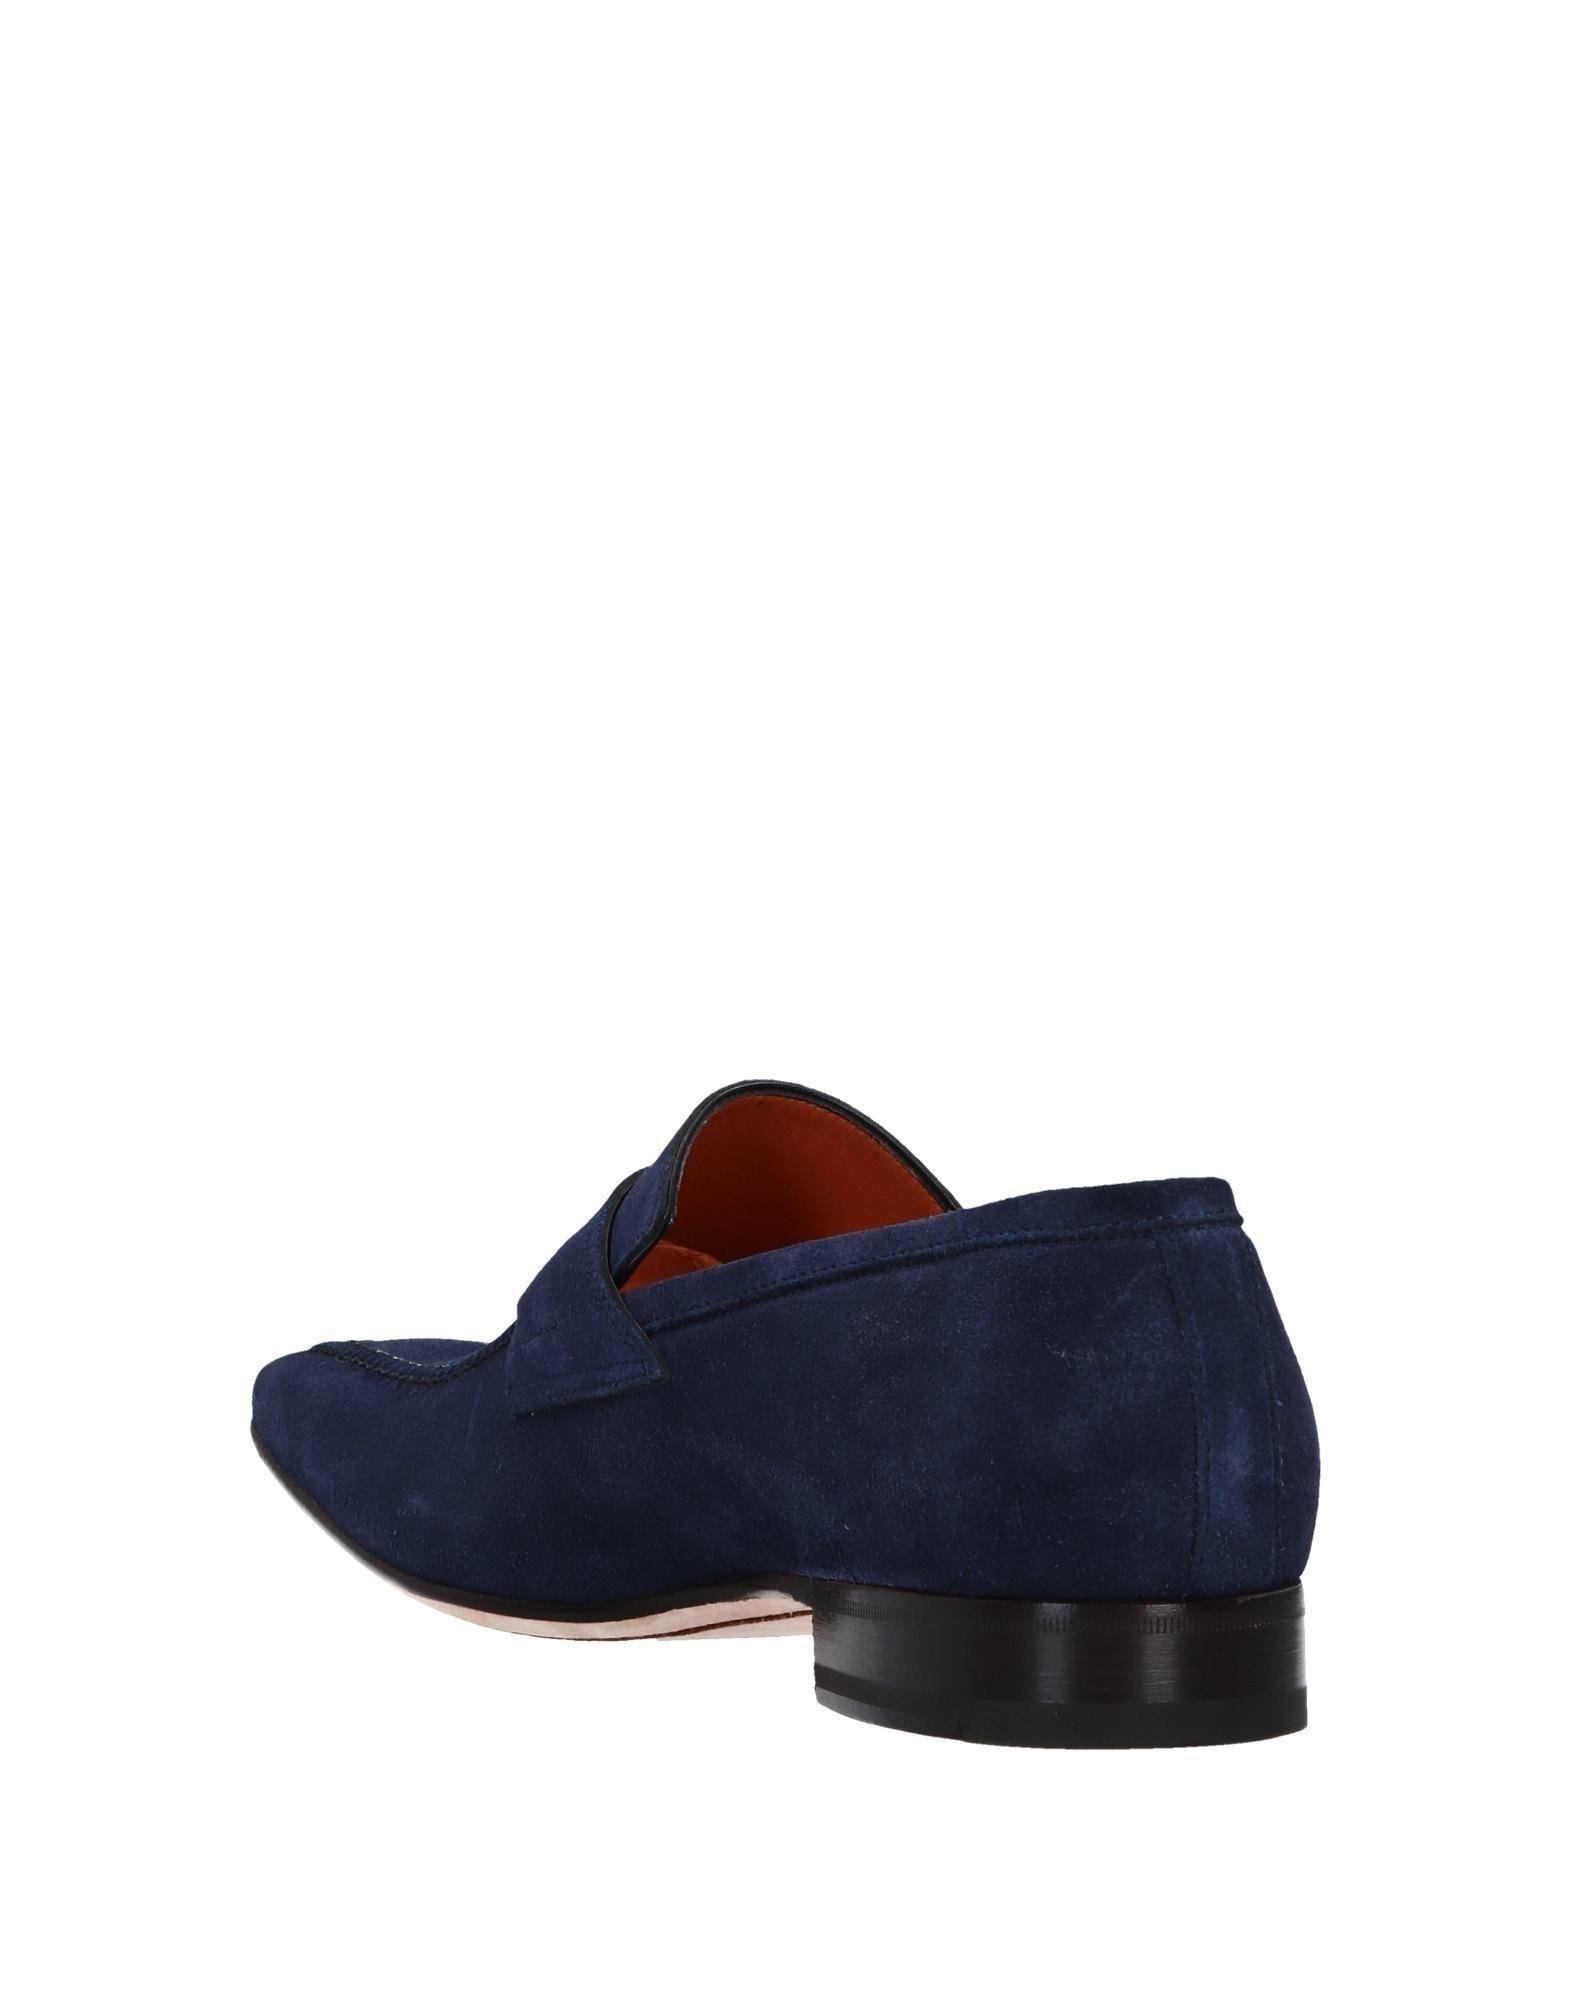 Santoni Mokassins Herren  11541315FE Schuhe Gute Qualität beliebte Schuhe 11541315FE 97c39d